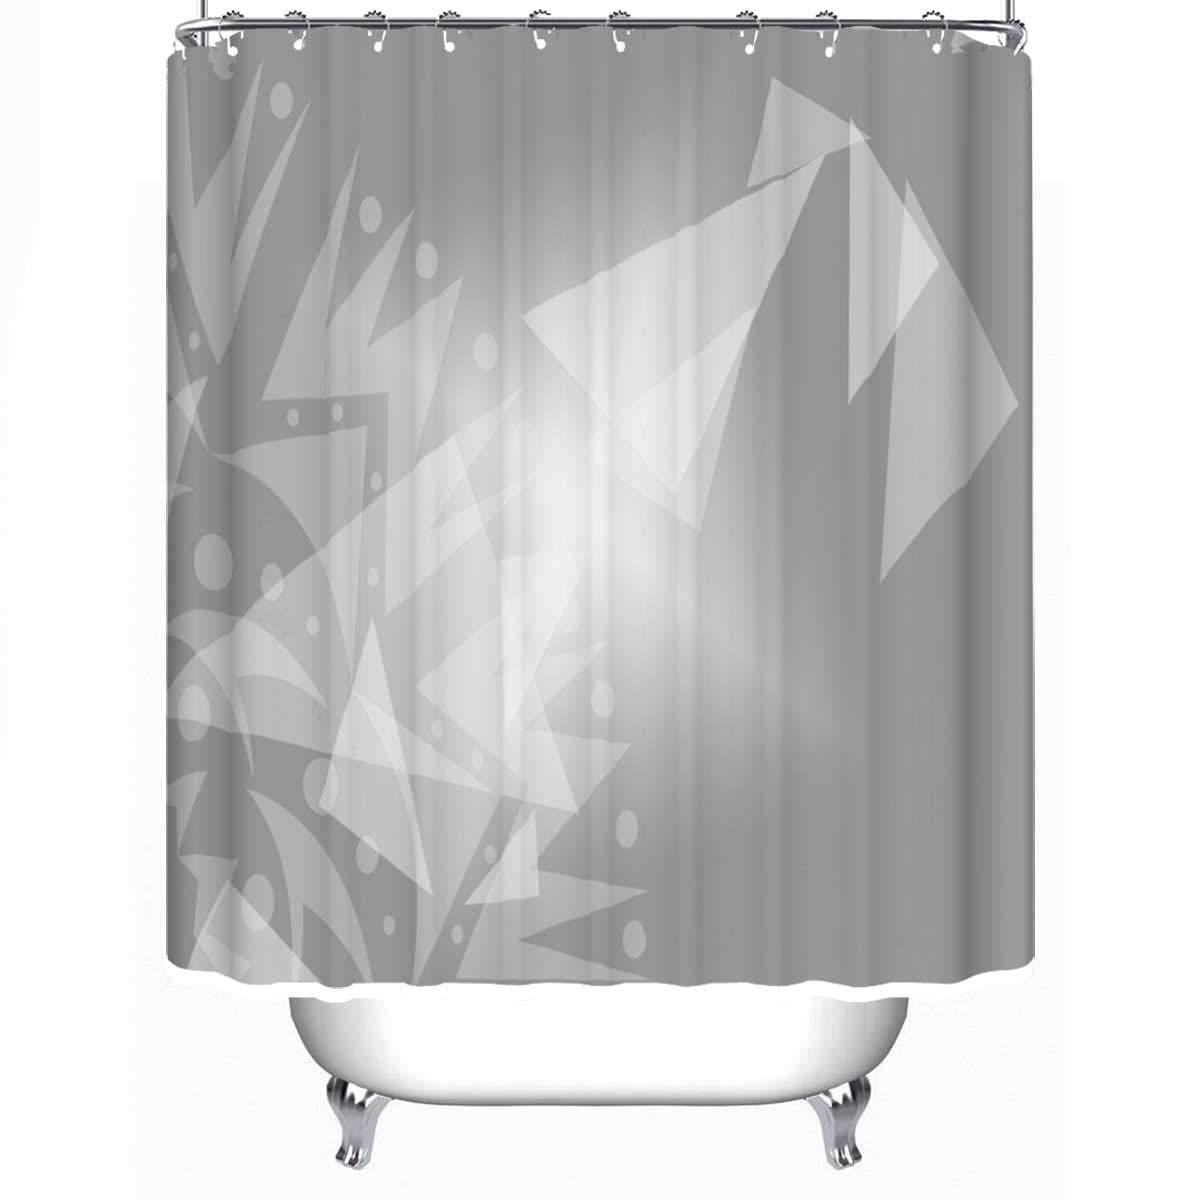 YOLIYANA Stylish White Background Presentation Printing Business Shower Curtain Turquoise Shower Curtain 79''Long x 71''Wide